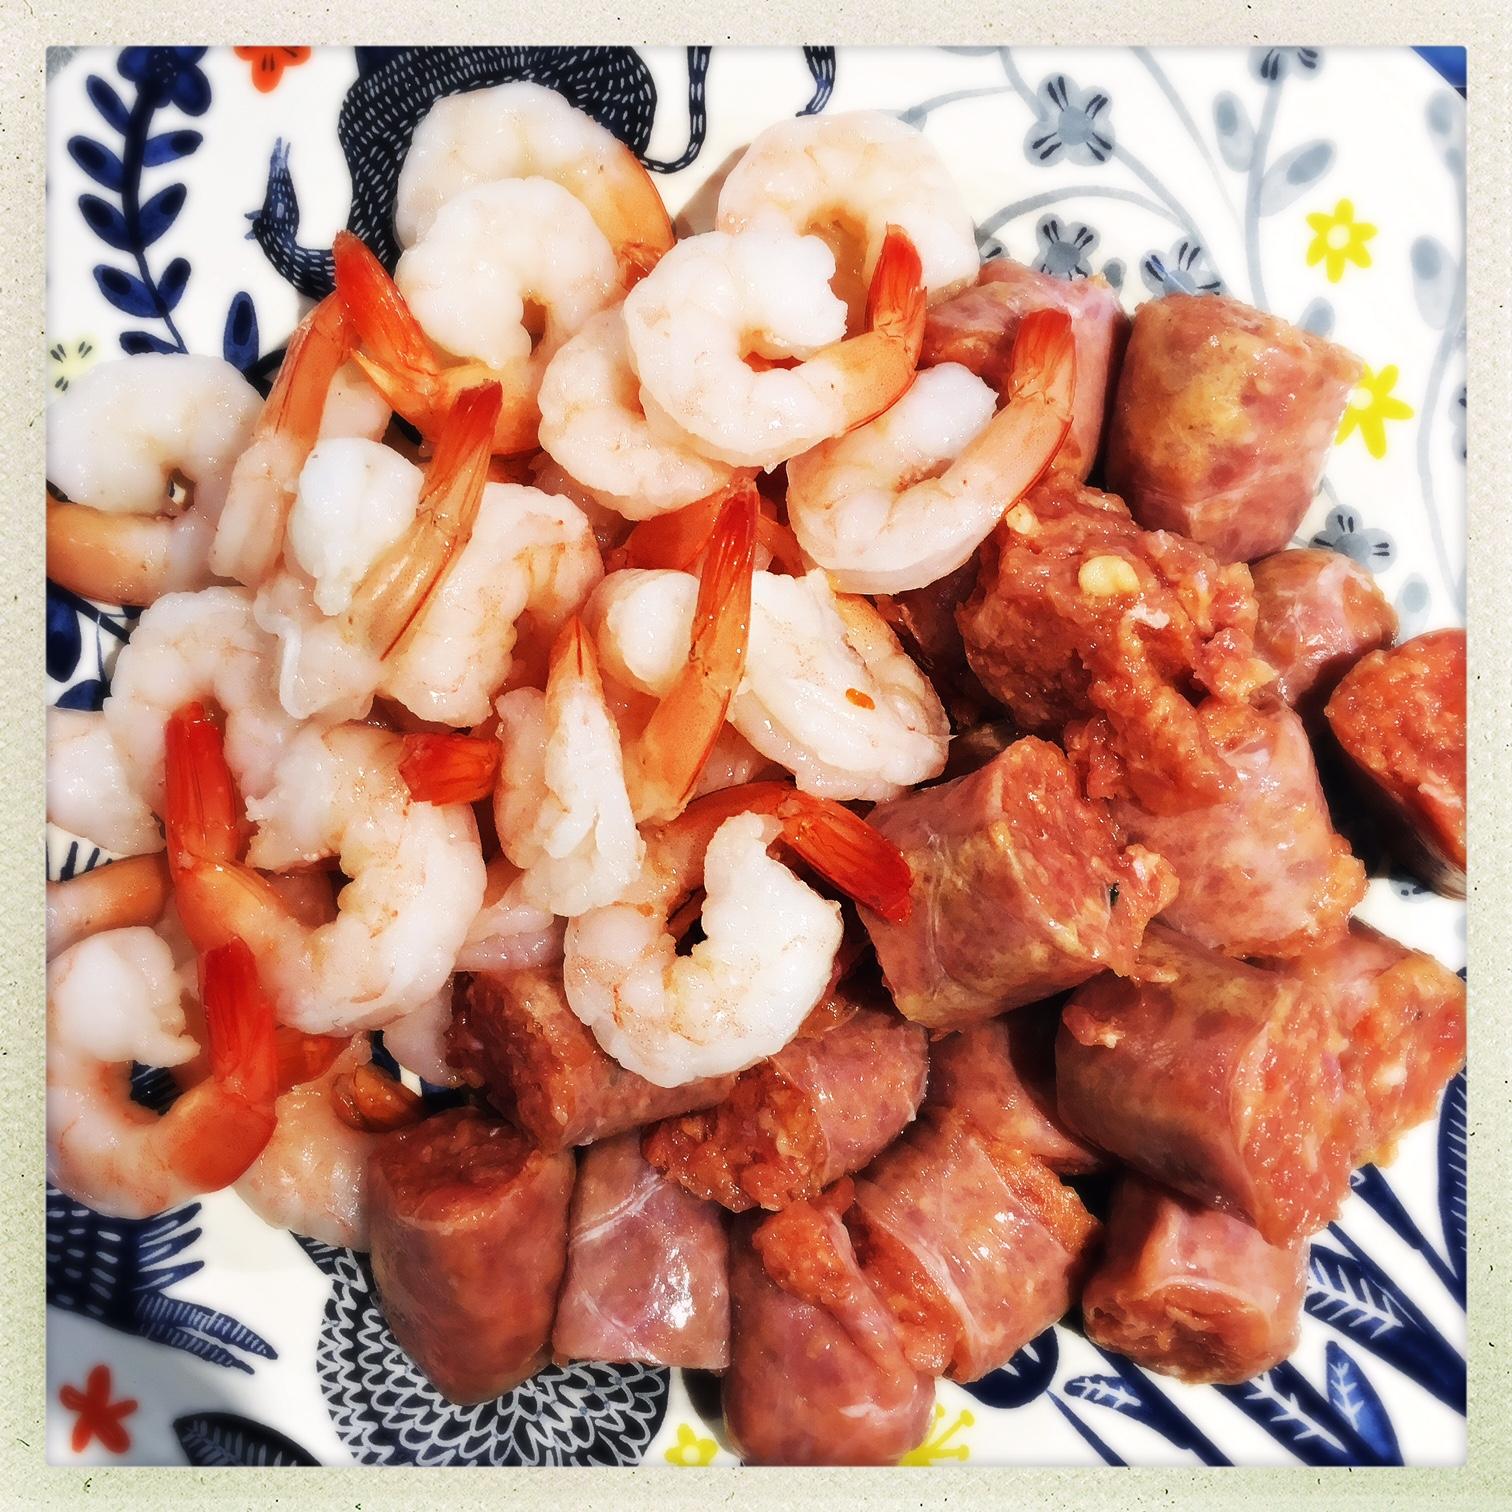 shrimp and sausage.jpg